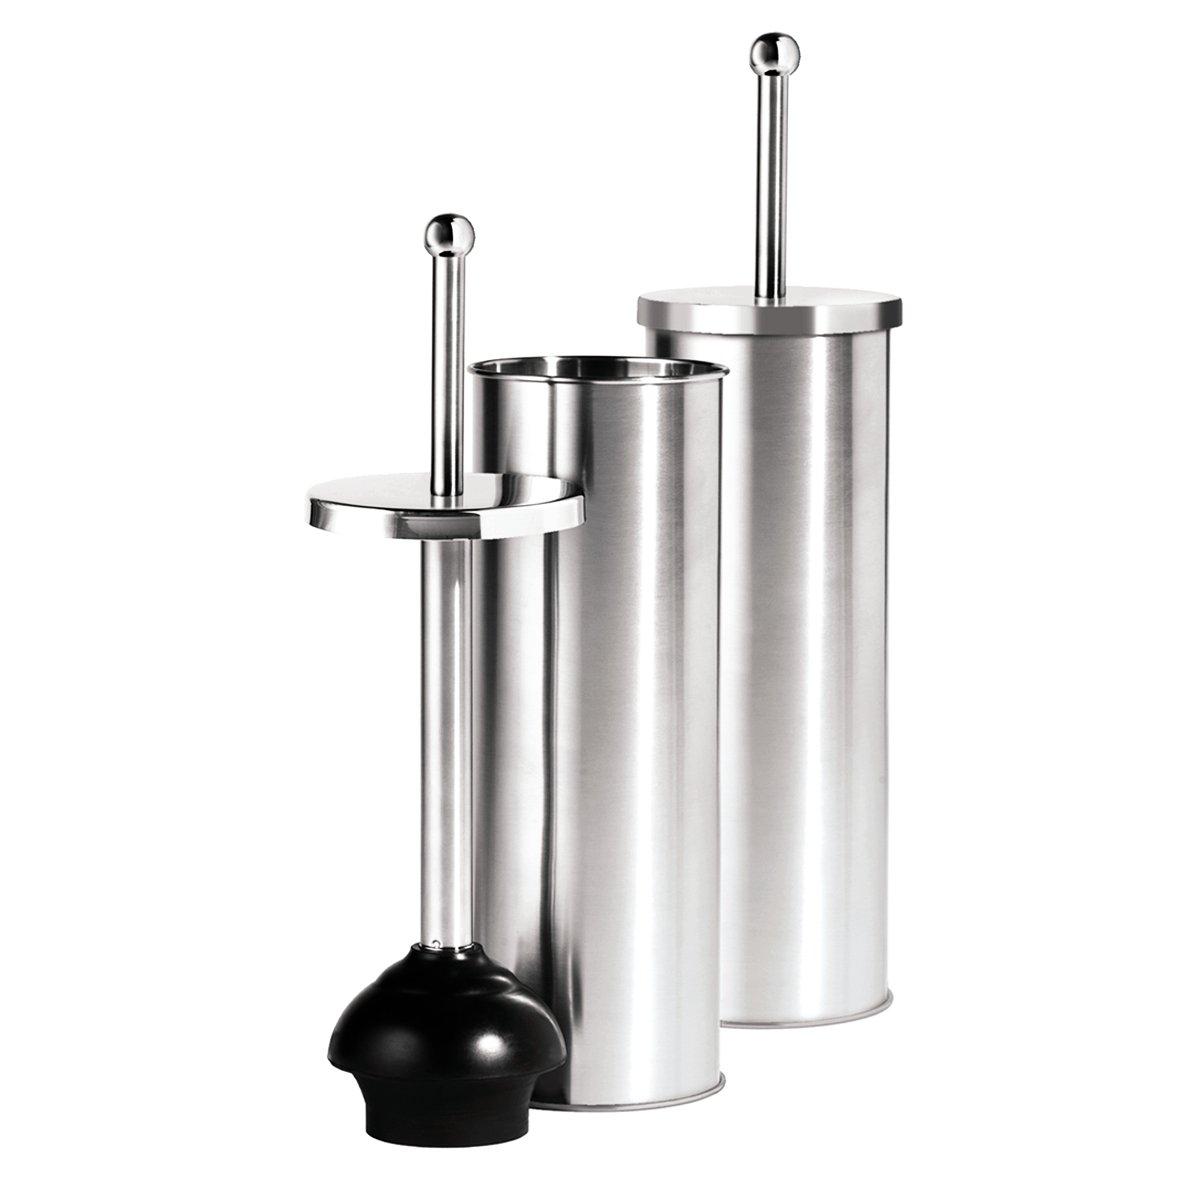 amazoncom oggi satin finish stainless steel  inch toilet  - amazoncom oggi satin finish stainless steel  inch toilet plunger andholder home  kitchen